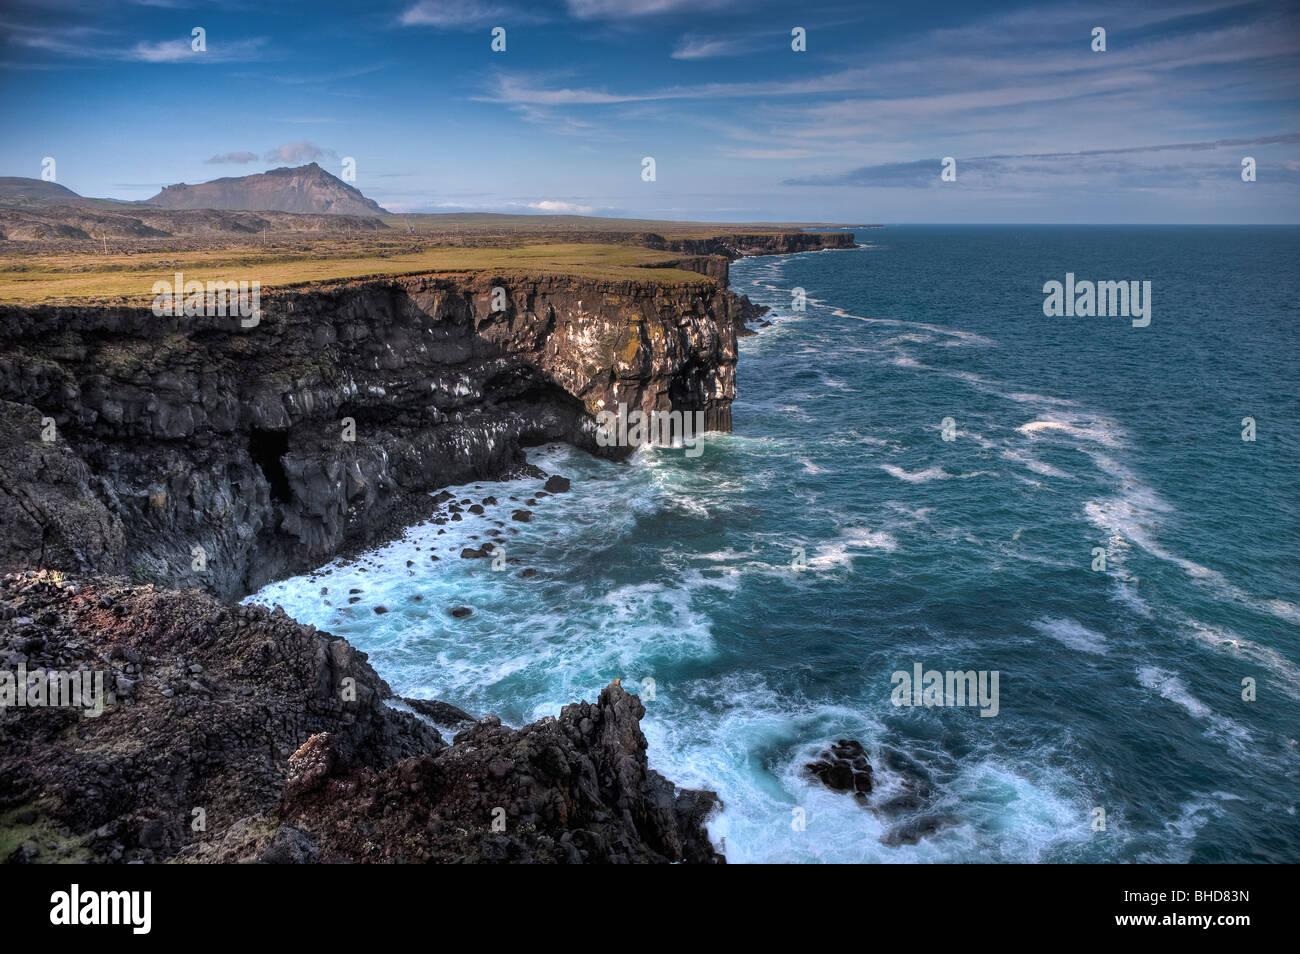 Arnarstapi, Snaefellsnes peninsula, Iceland - Stock Image